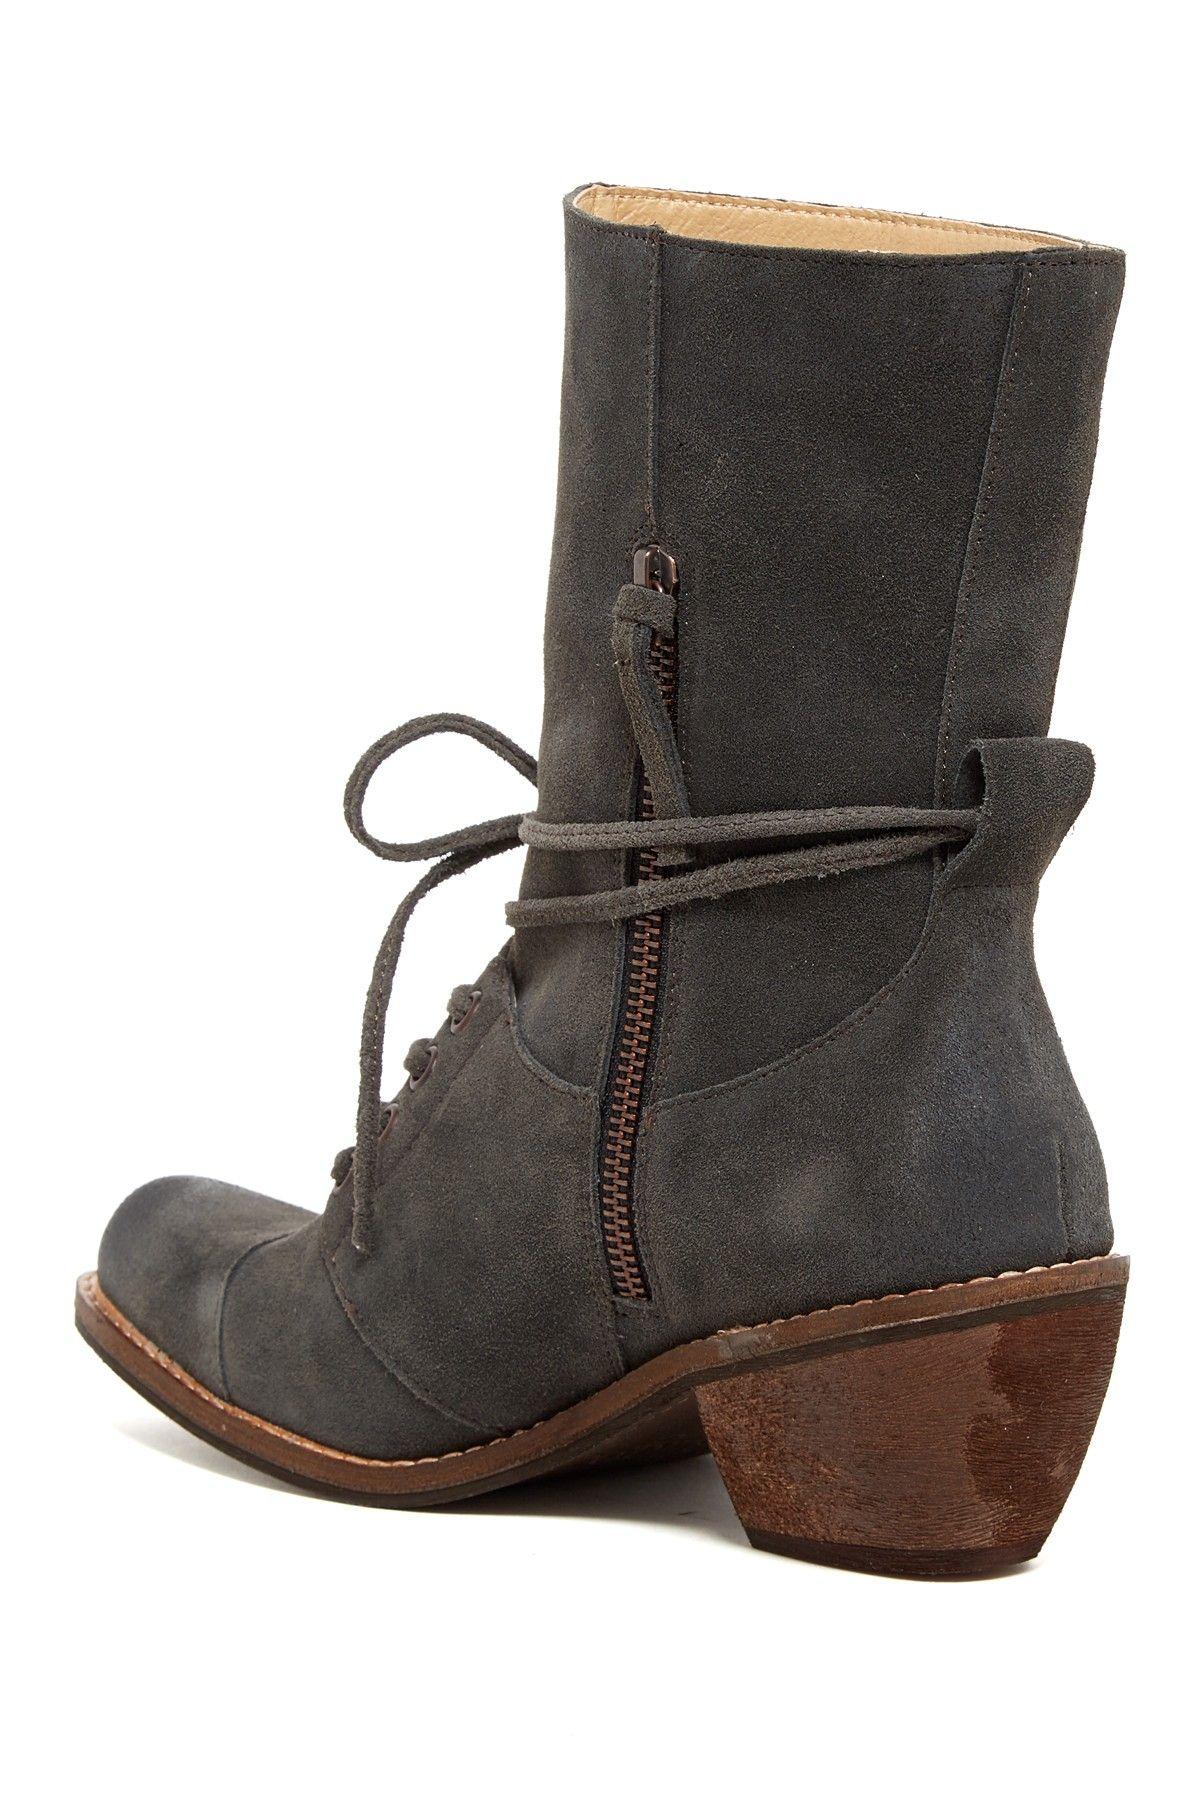 Latigo Portland Boot Boots, Nordstrom rack, Shoes